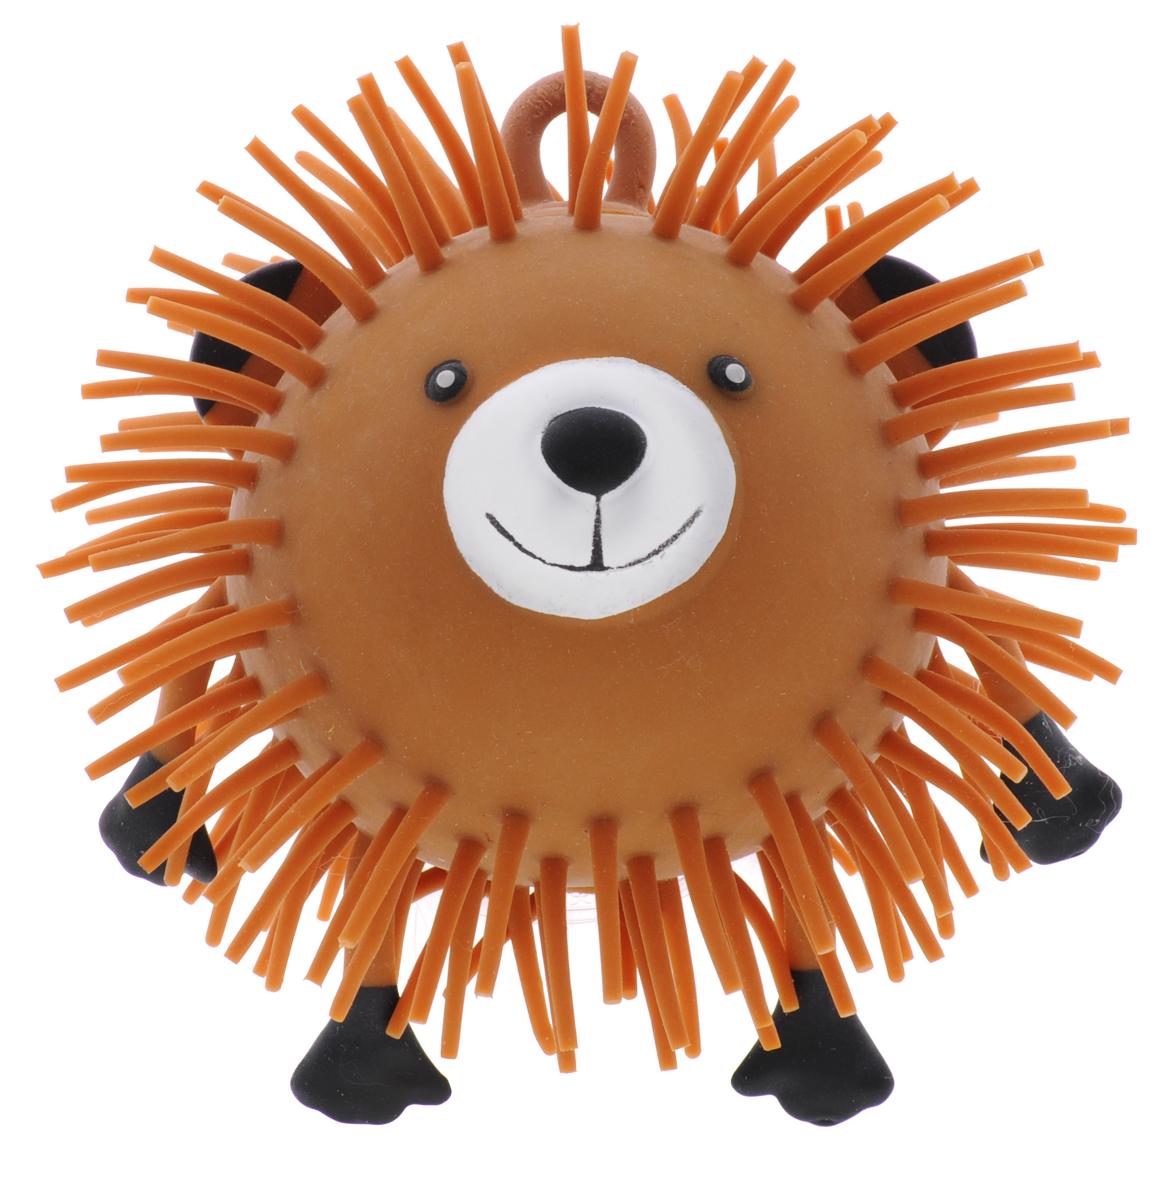 1TOY Игрушка-антистресс Ё-Ёжик Животное цвет коричневый 1toy игрушка антистресс ё ёжик животное цвет розовый